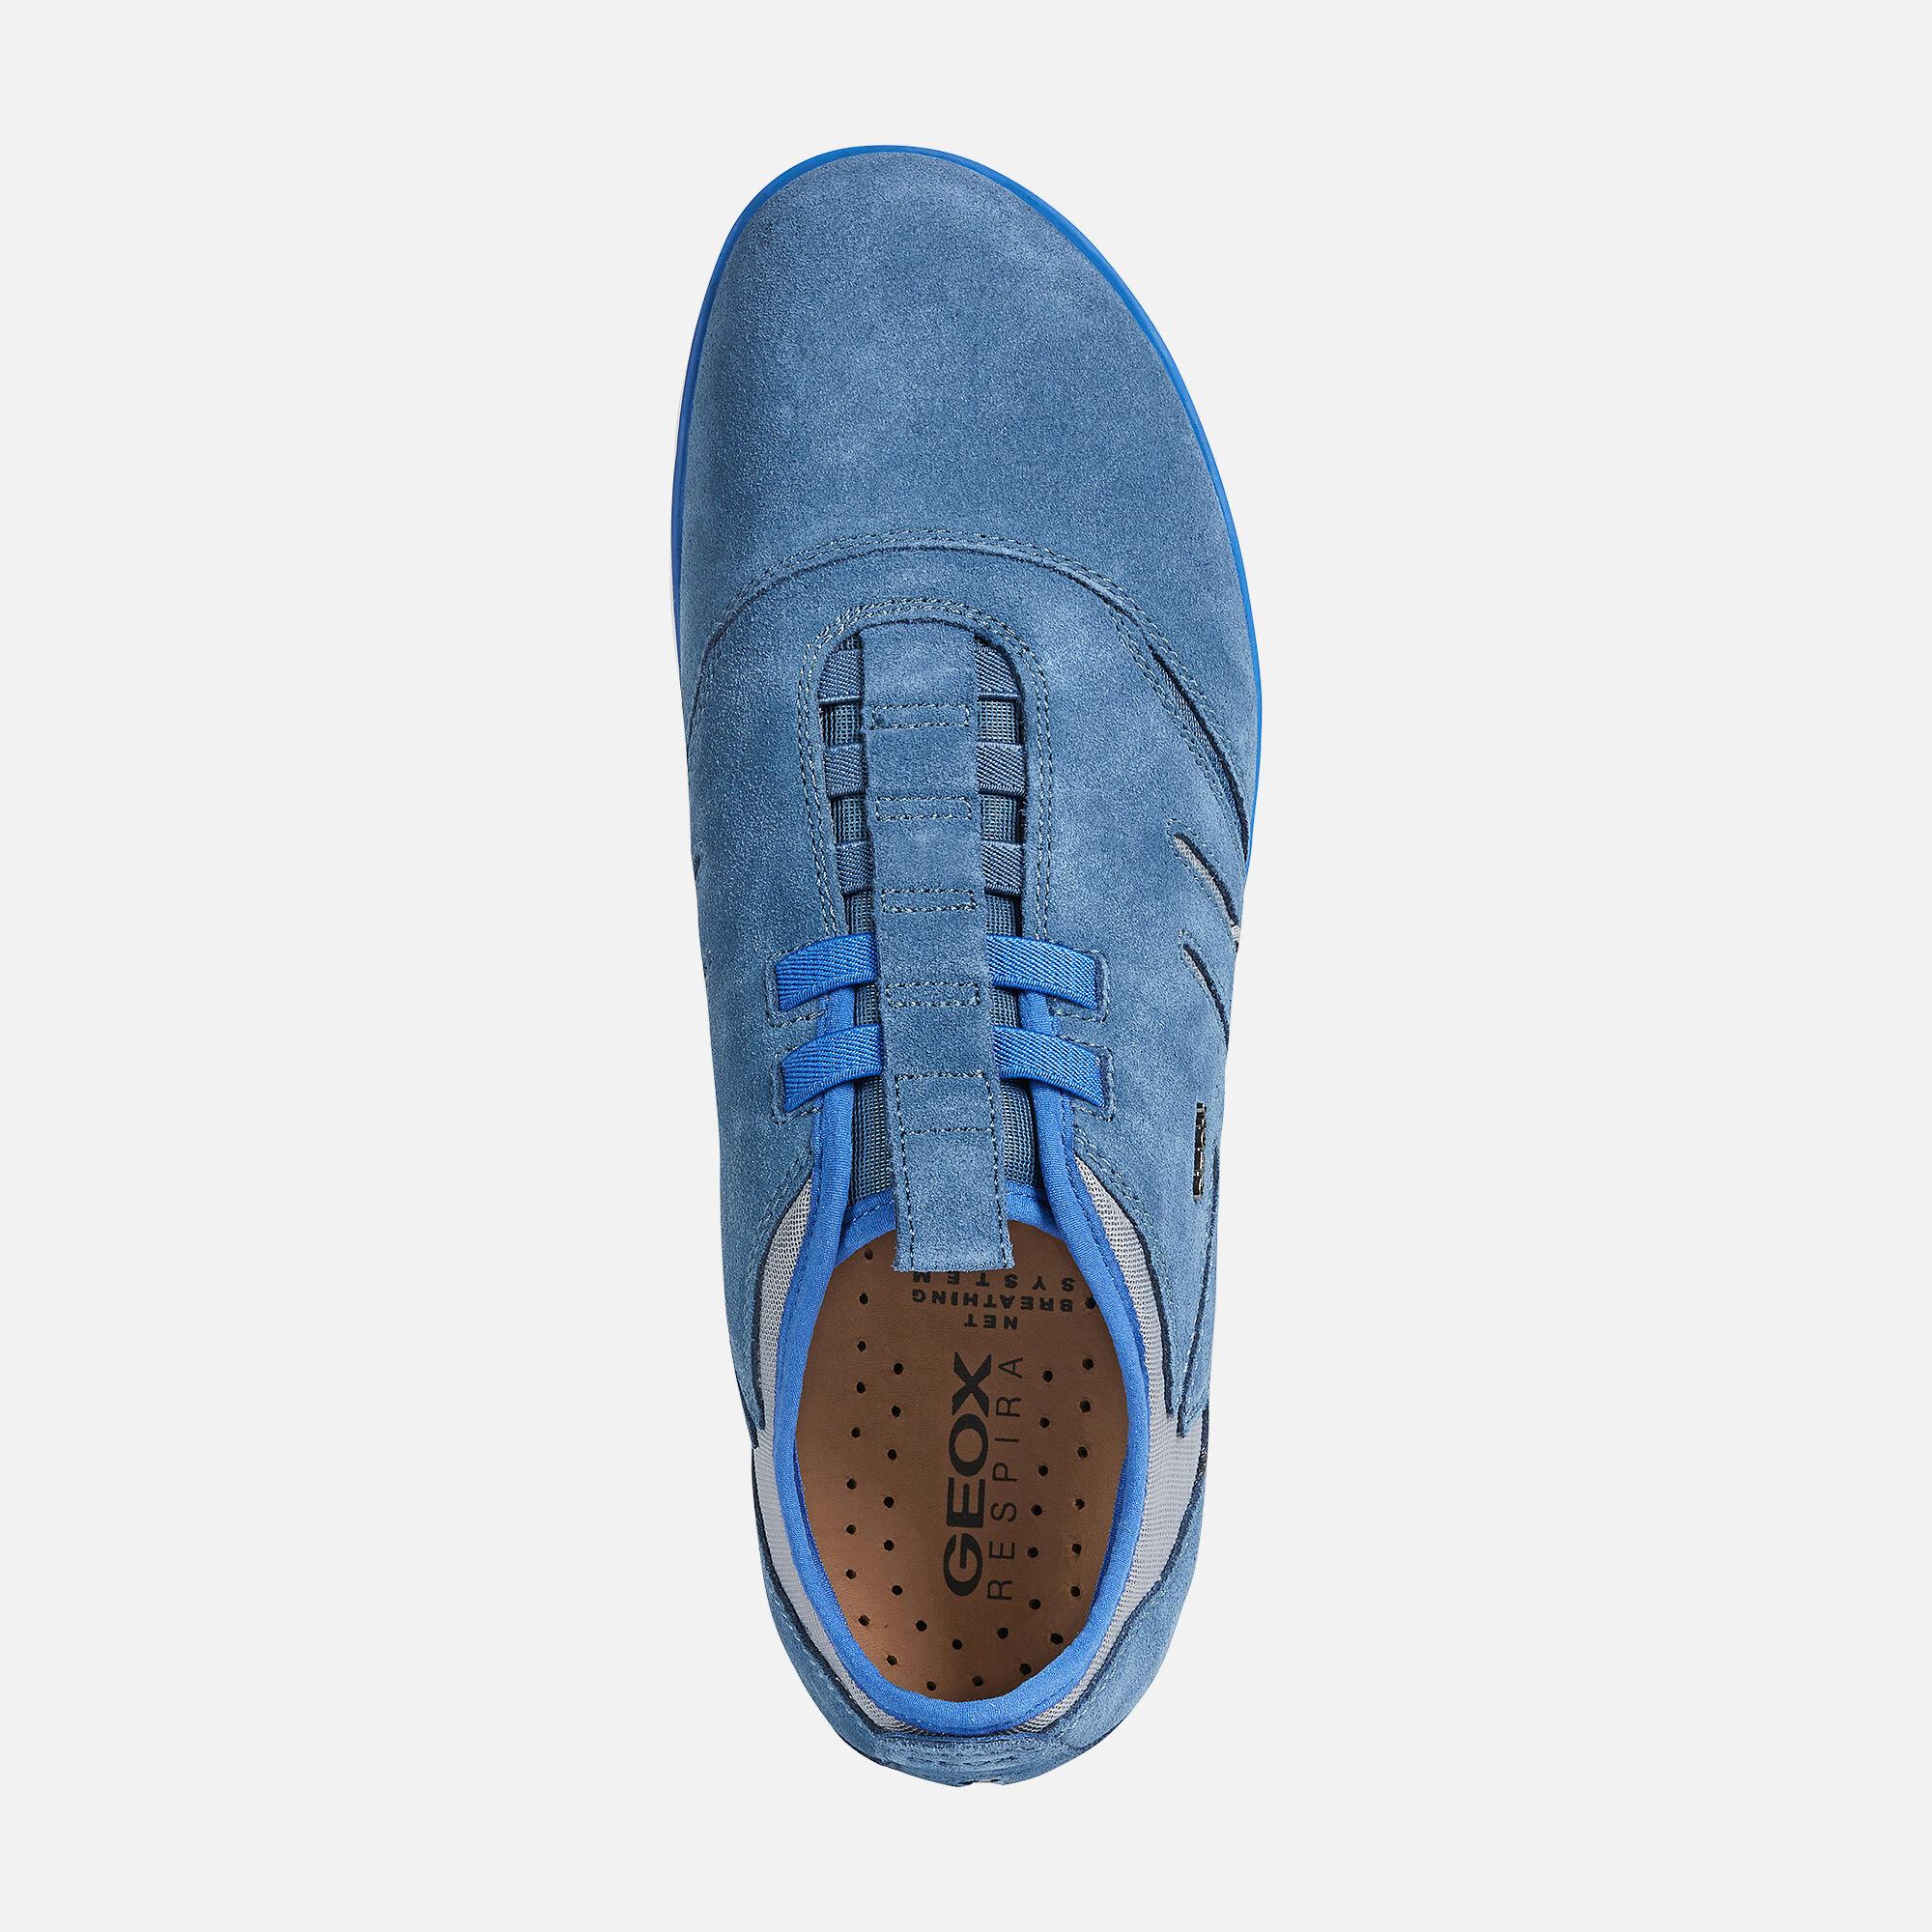 Geox NEBULA Man: Airforce blue Sneakers